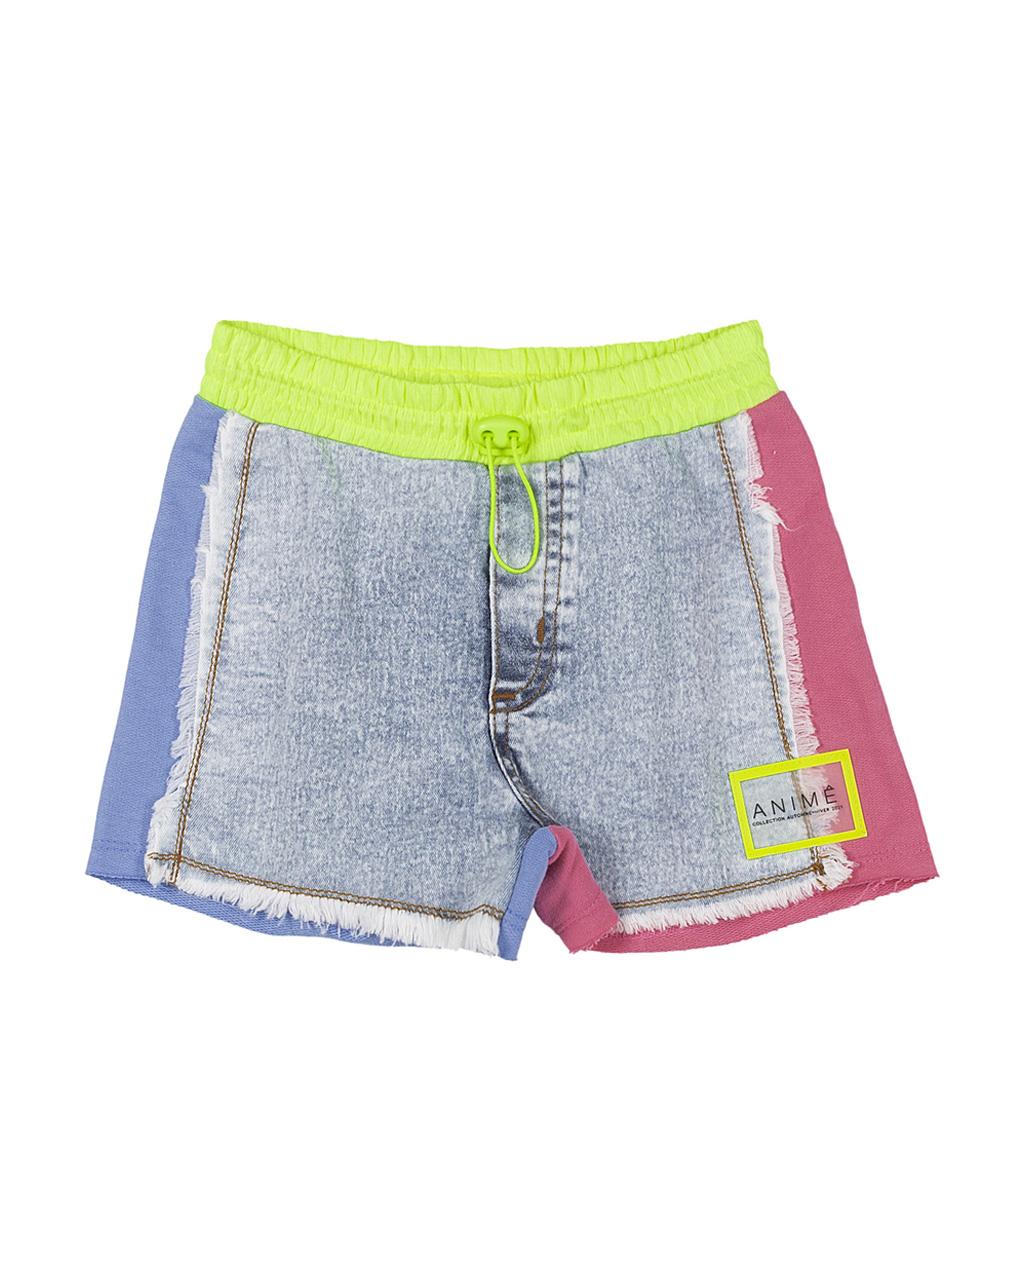 Shorts Infantil Jeans Com Detalhes Rosa Azul Neon Animê